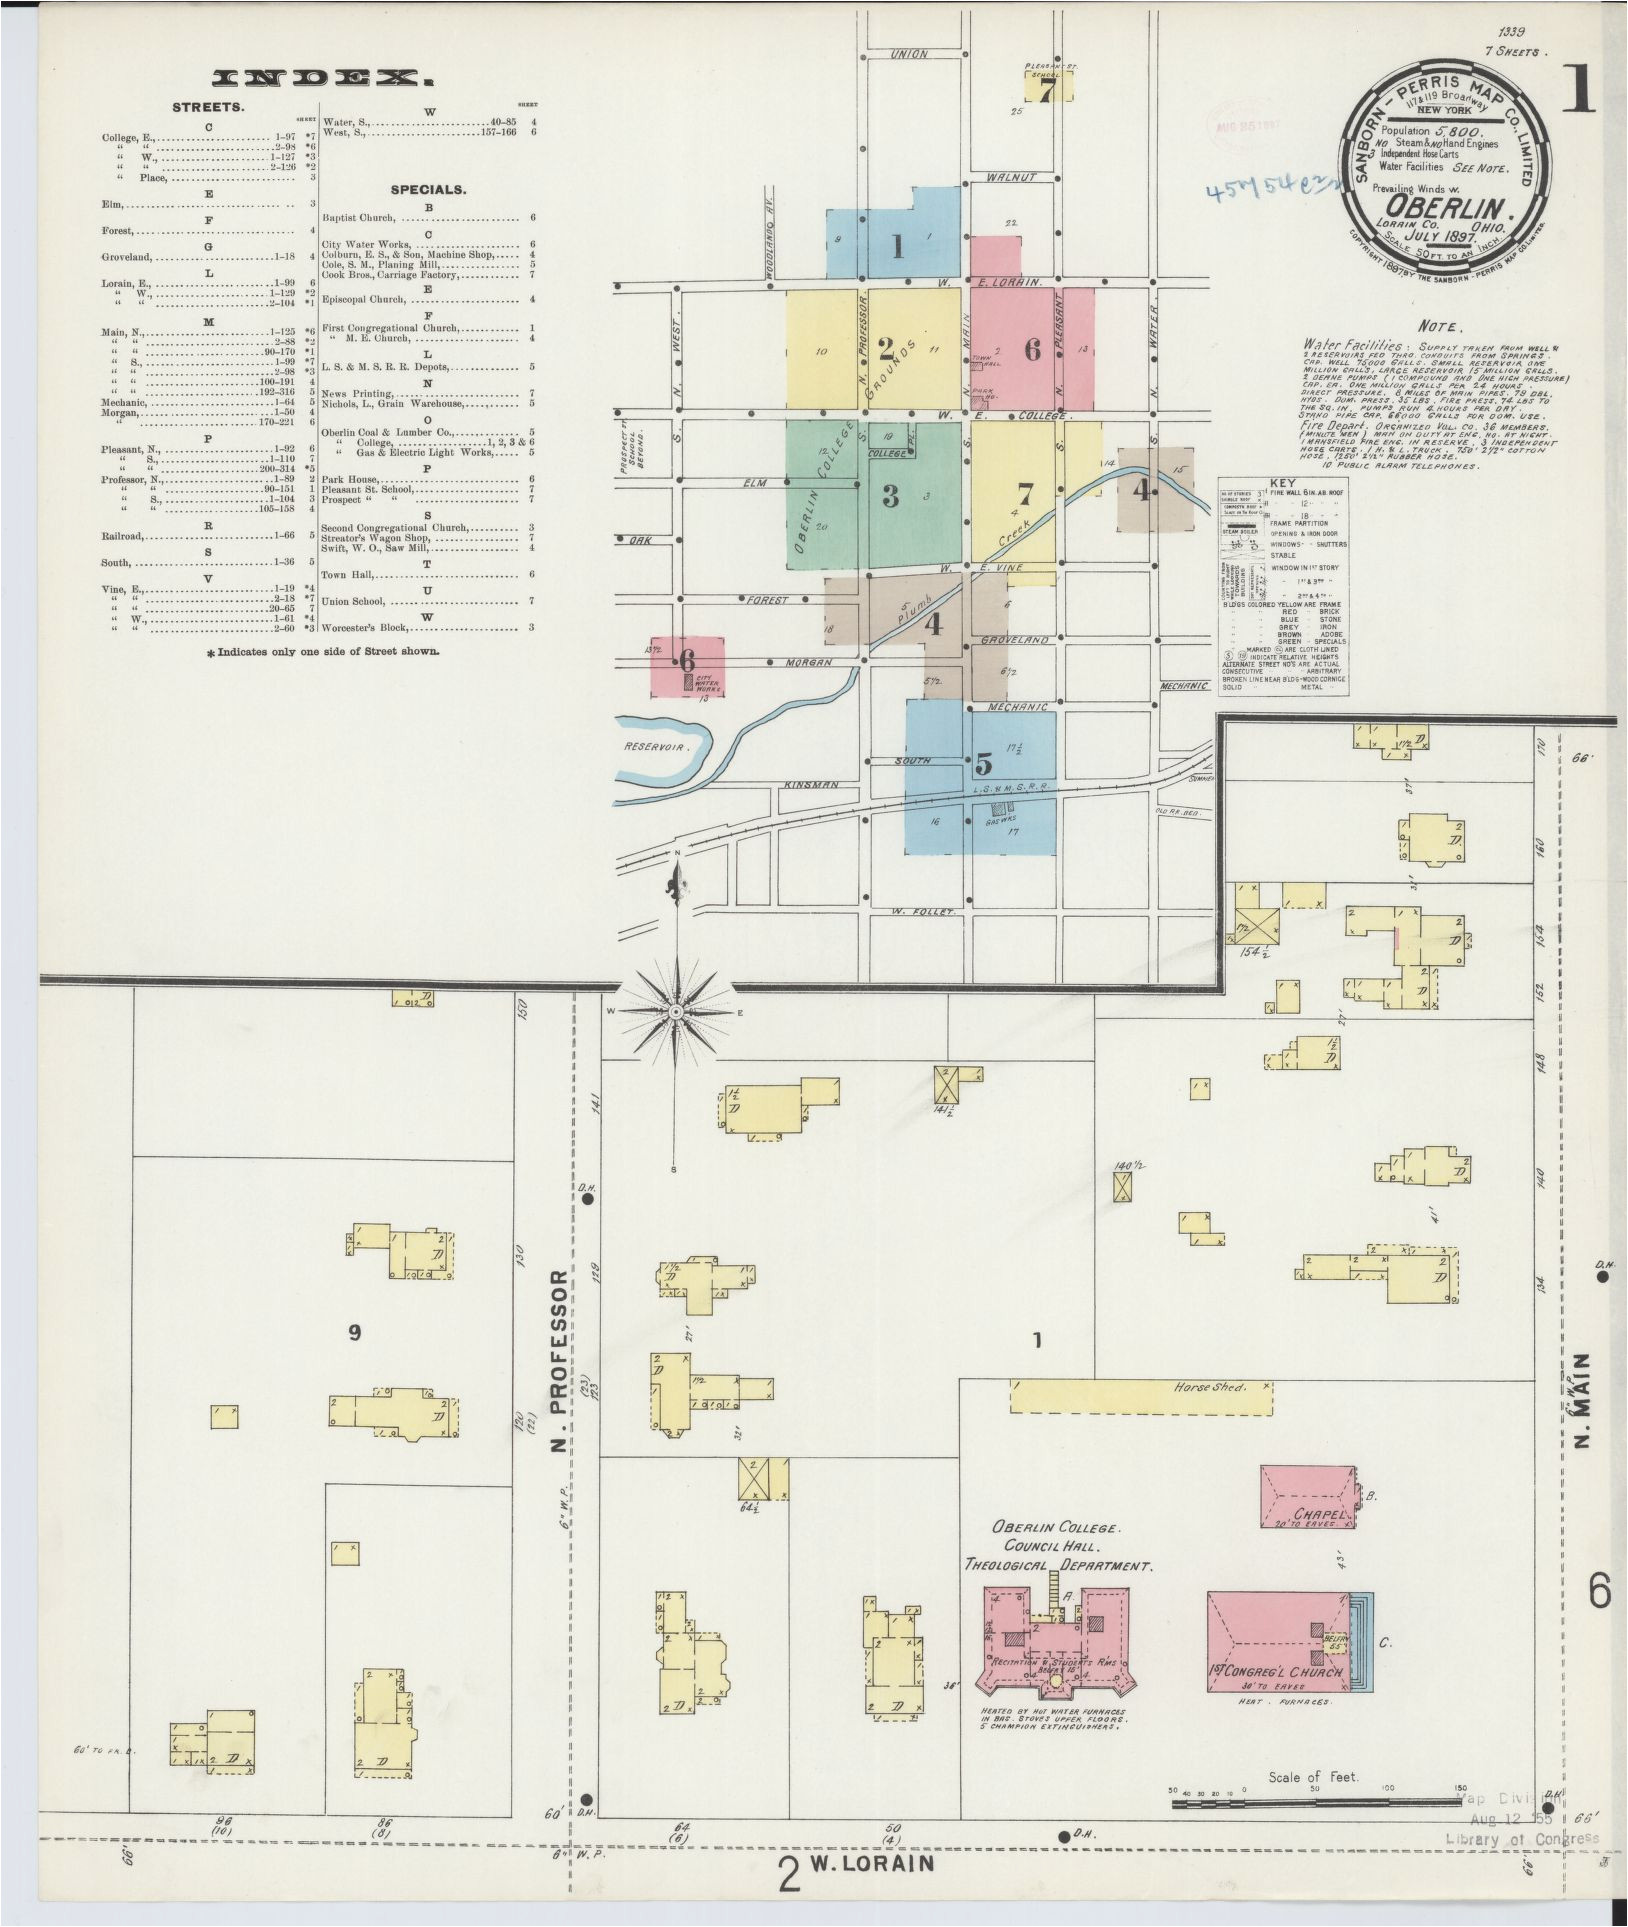 meigs county ohio property maps beautiful map ohio ny county map